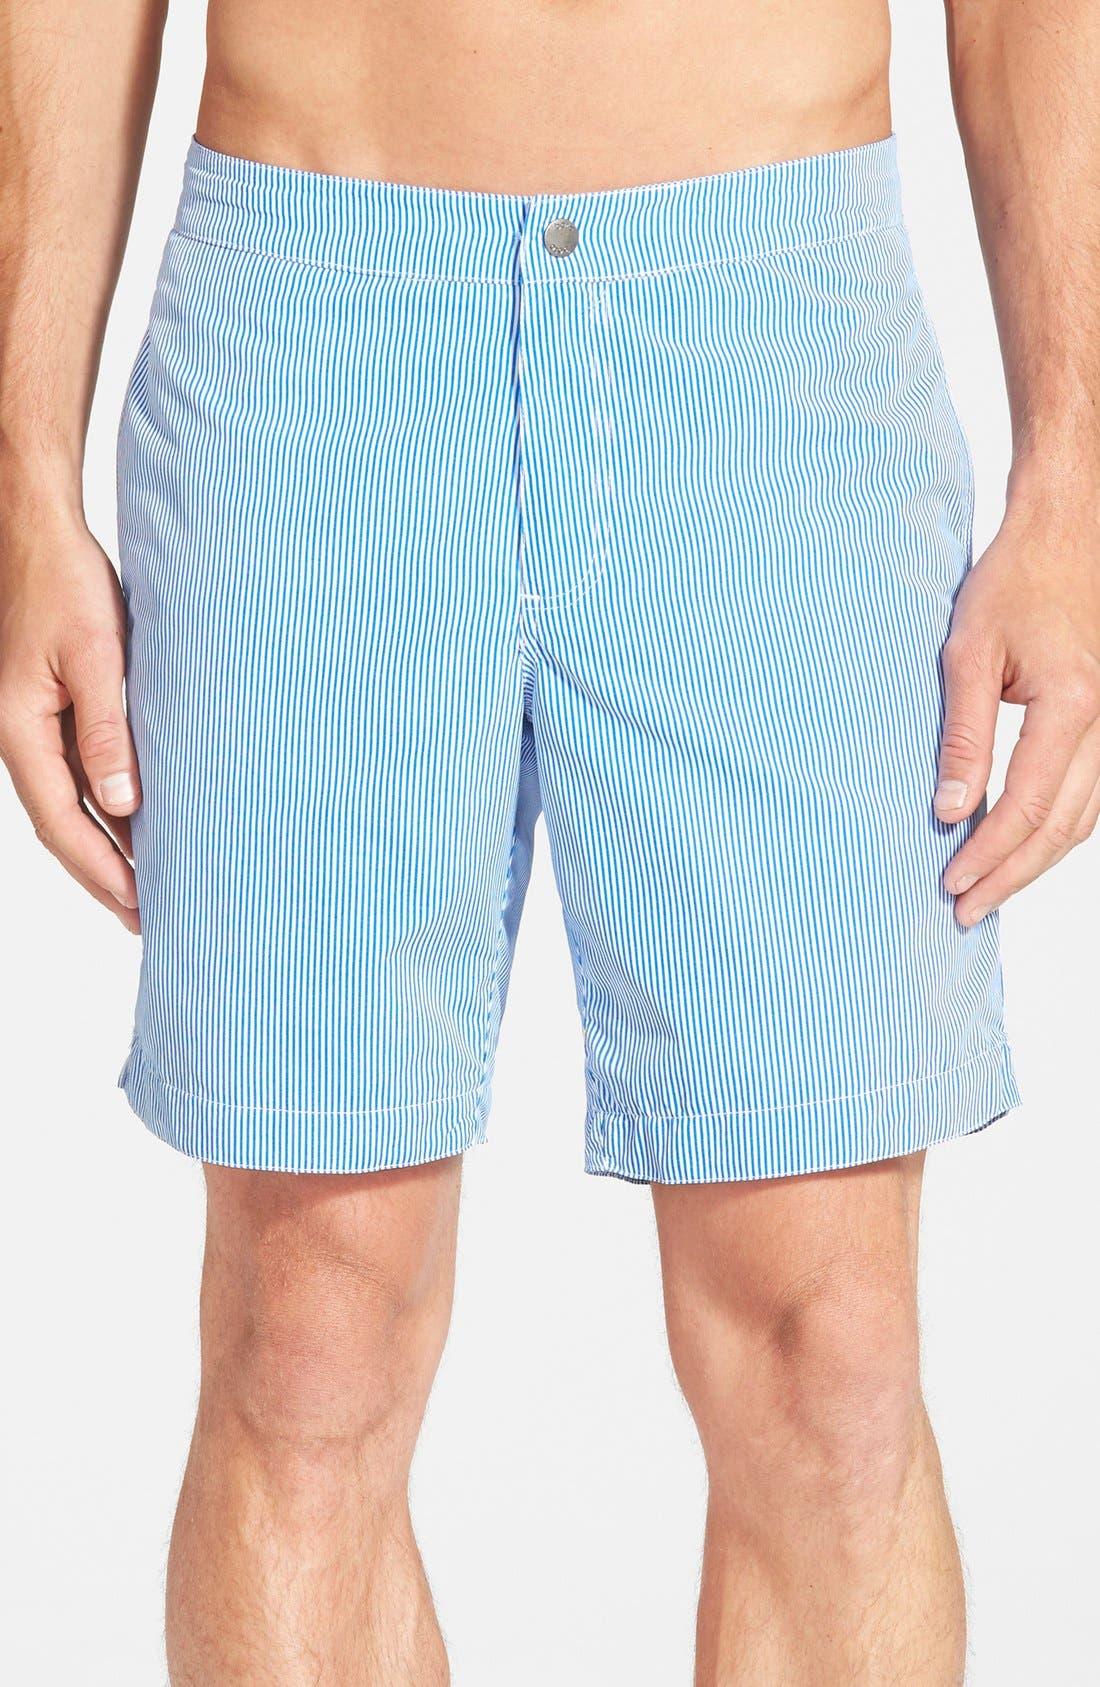 boto 'Aruba - Stripe' Tailored Fit 8.5 Inch Board Shorts